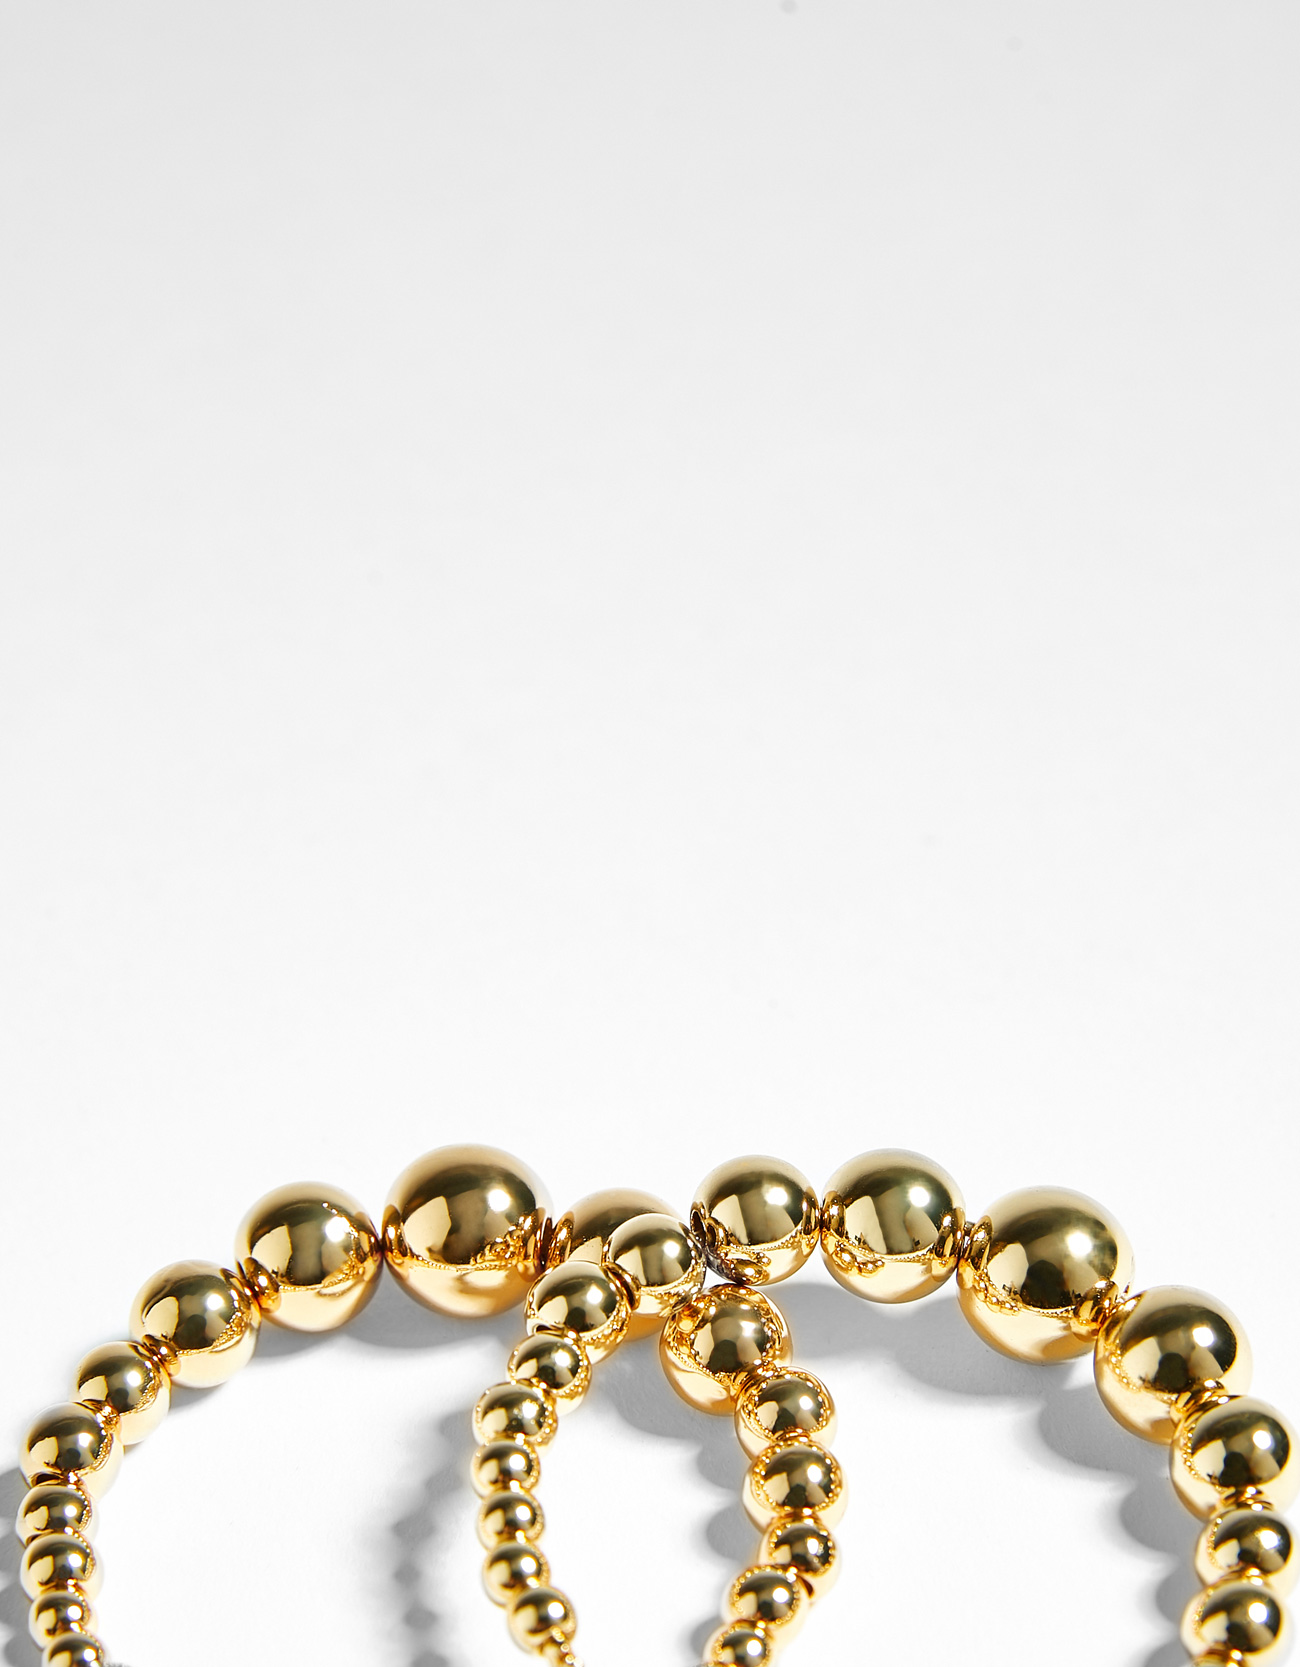 Hoop earrings with gold faux pearls - Jewellery - Bershka Tunisia